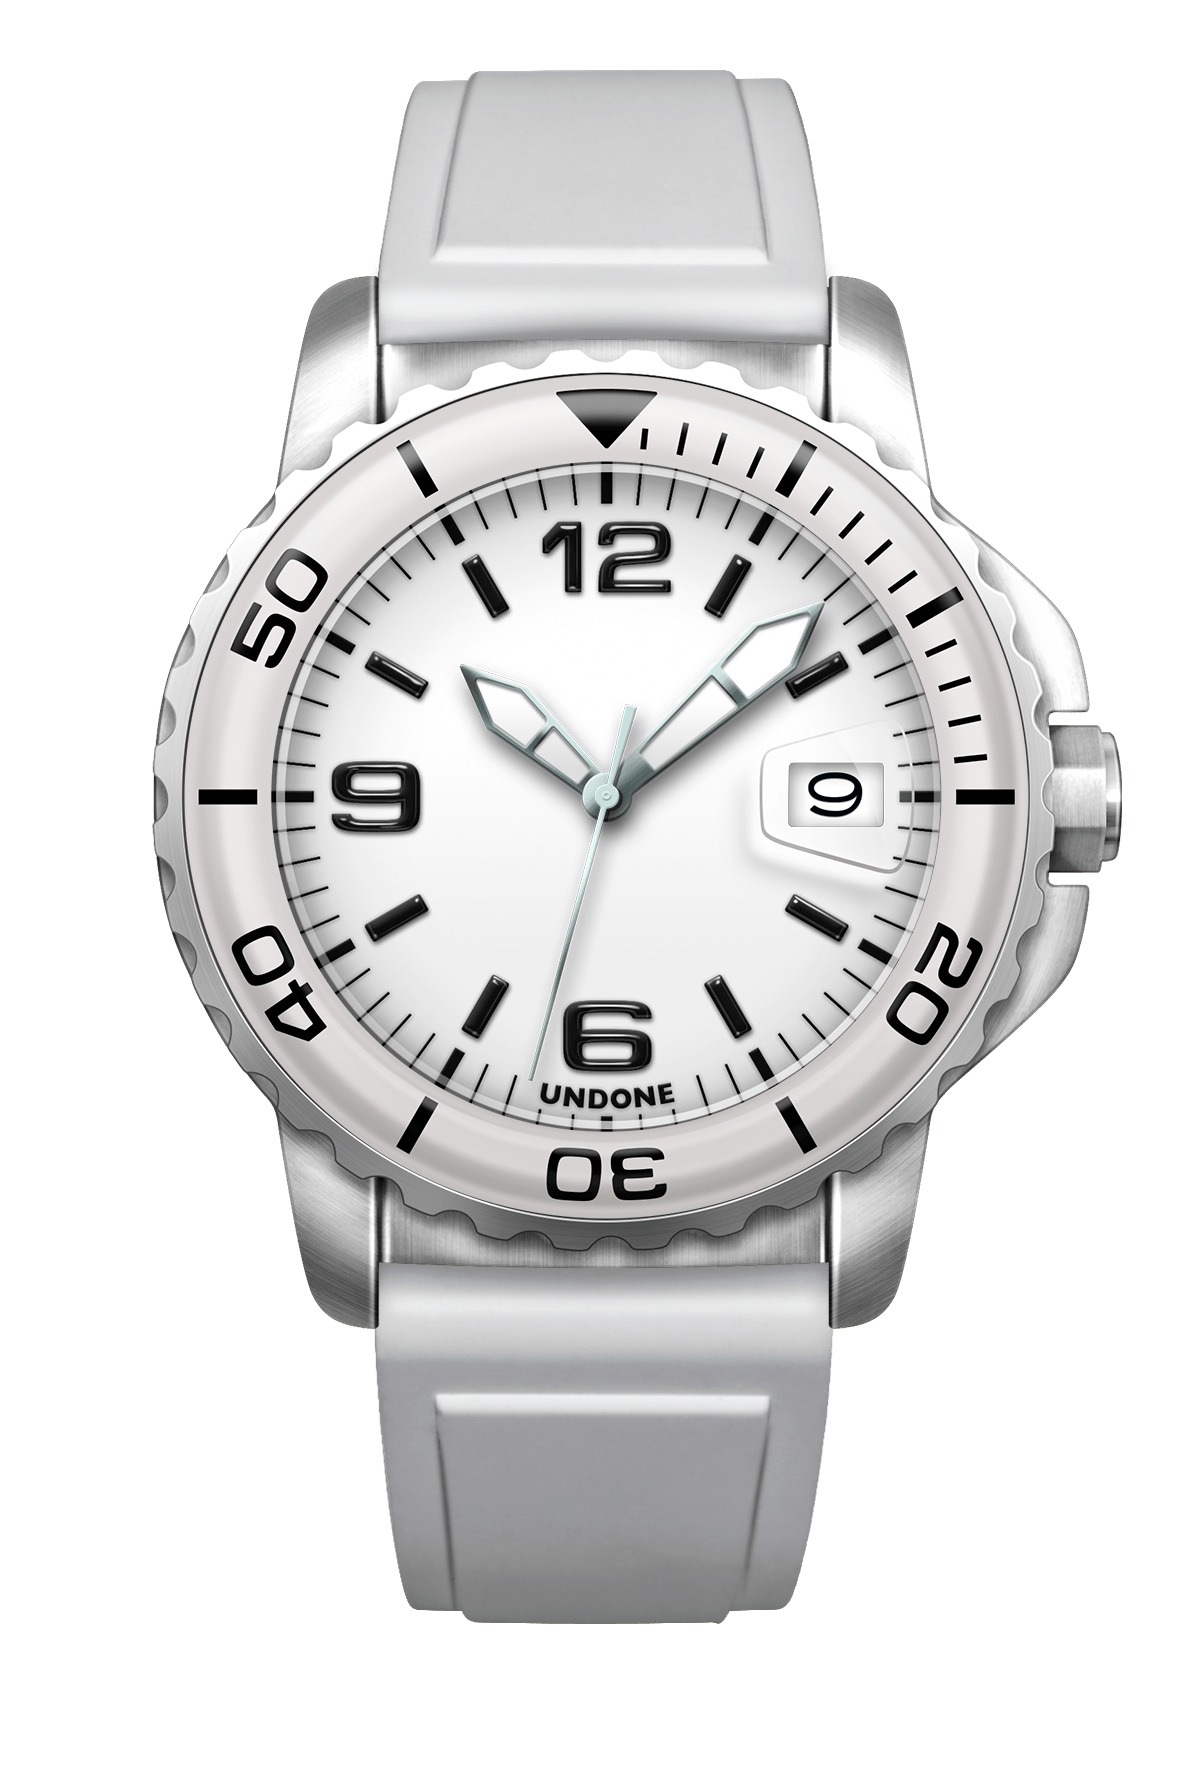 undone white color watch